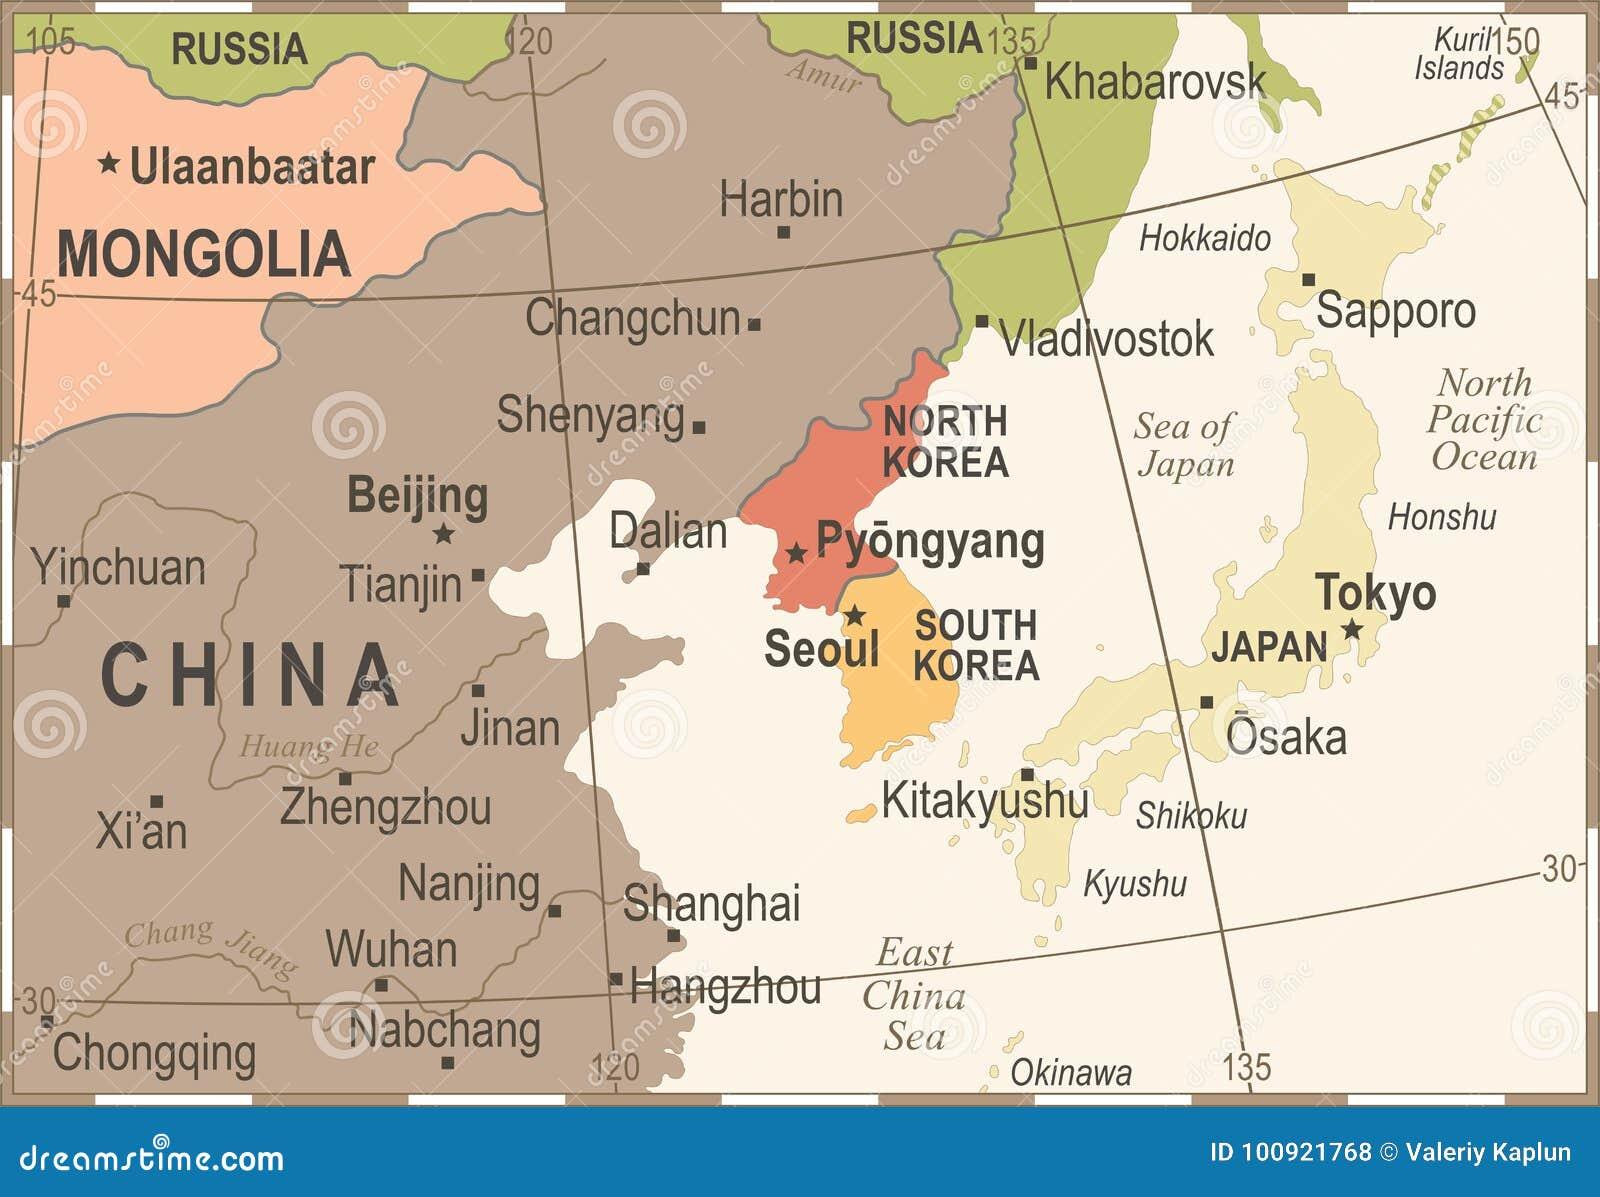 North korea south korea japan china russia mongolia map vintage north korea south korea japan china russia mongolia map vintage detailed vector illustration gumiabroncs Gallery